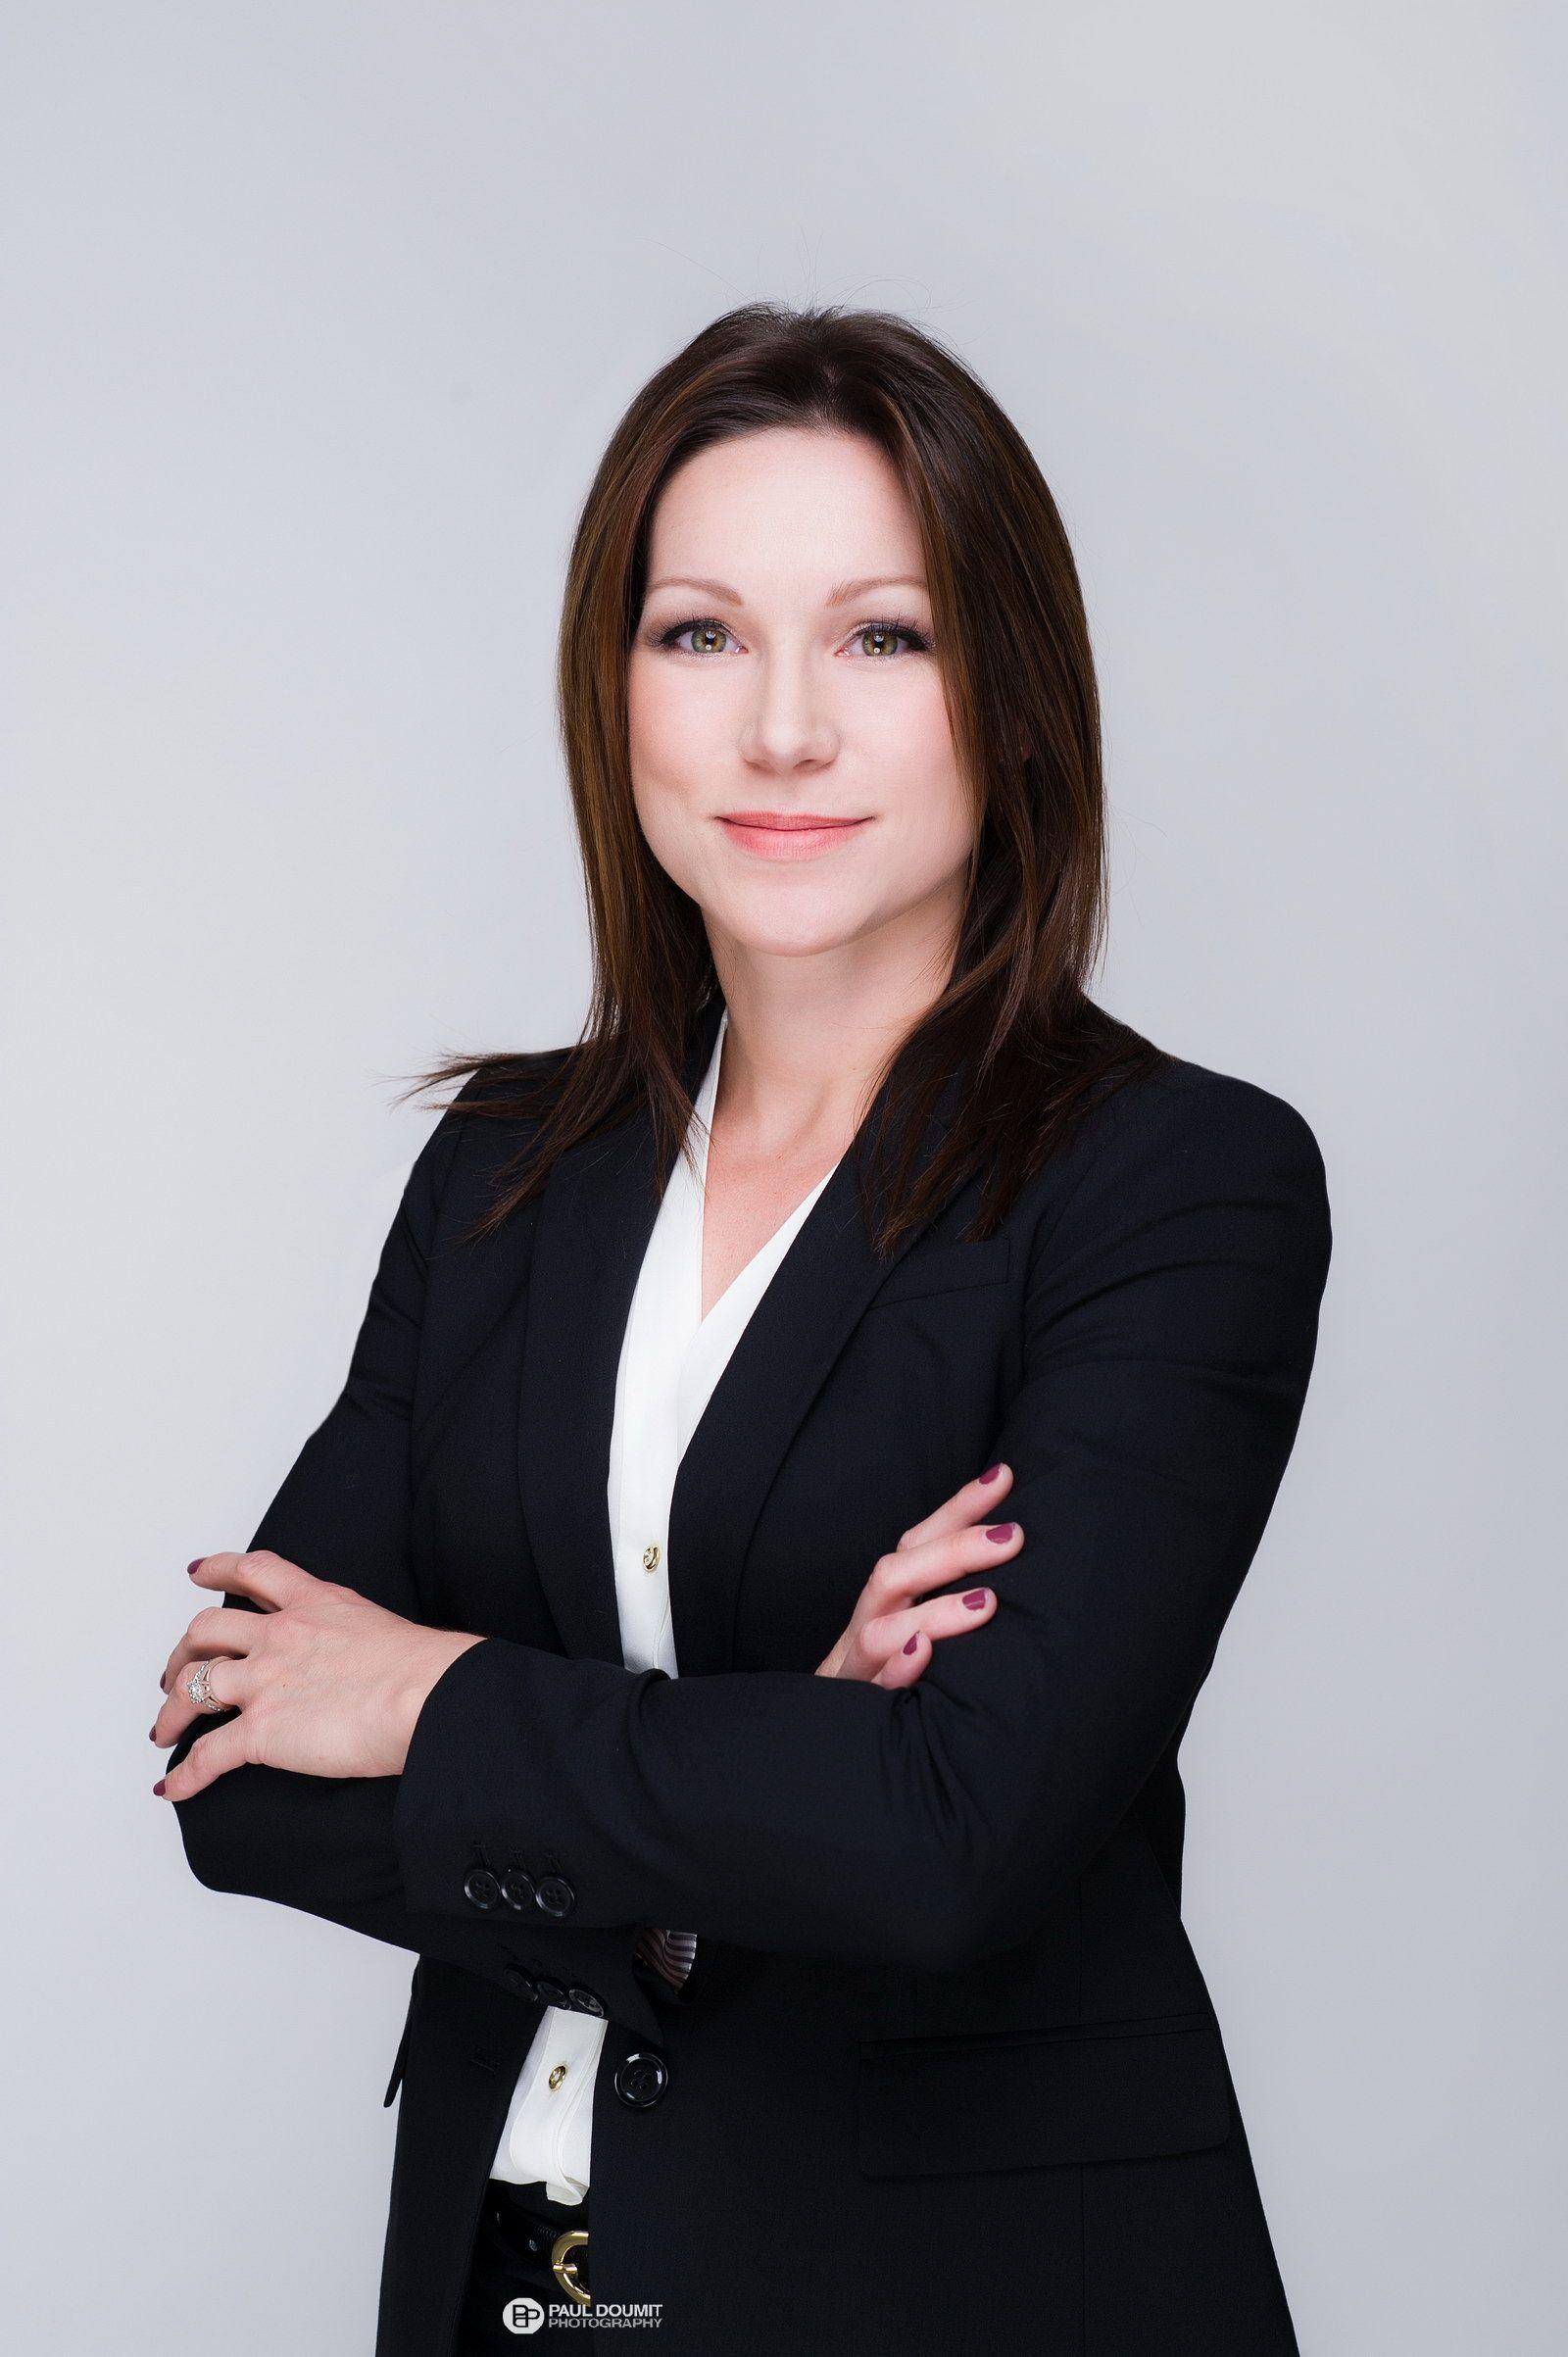 Female Corporate Headshot Realtor Business Women Business